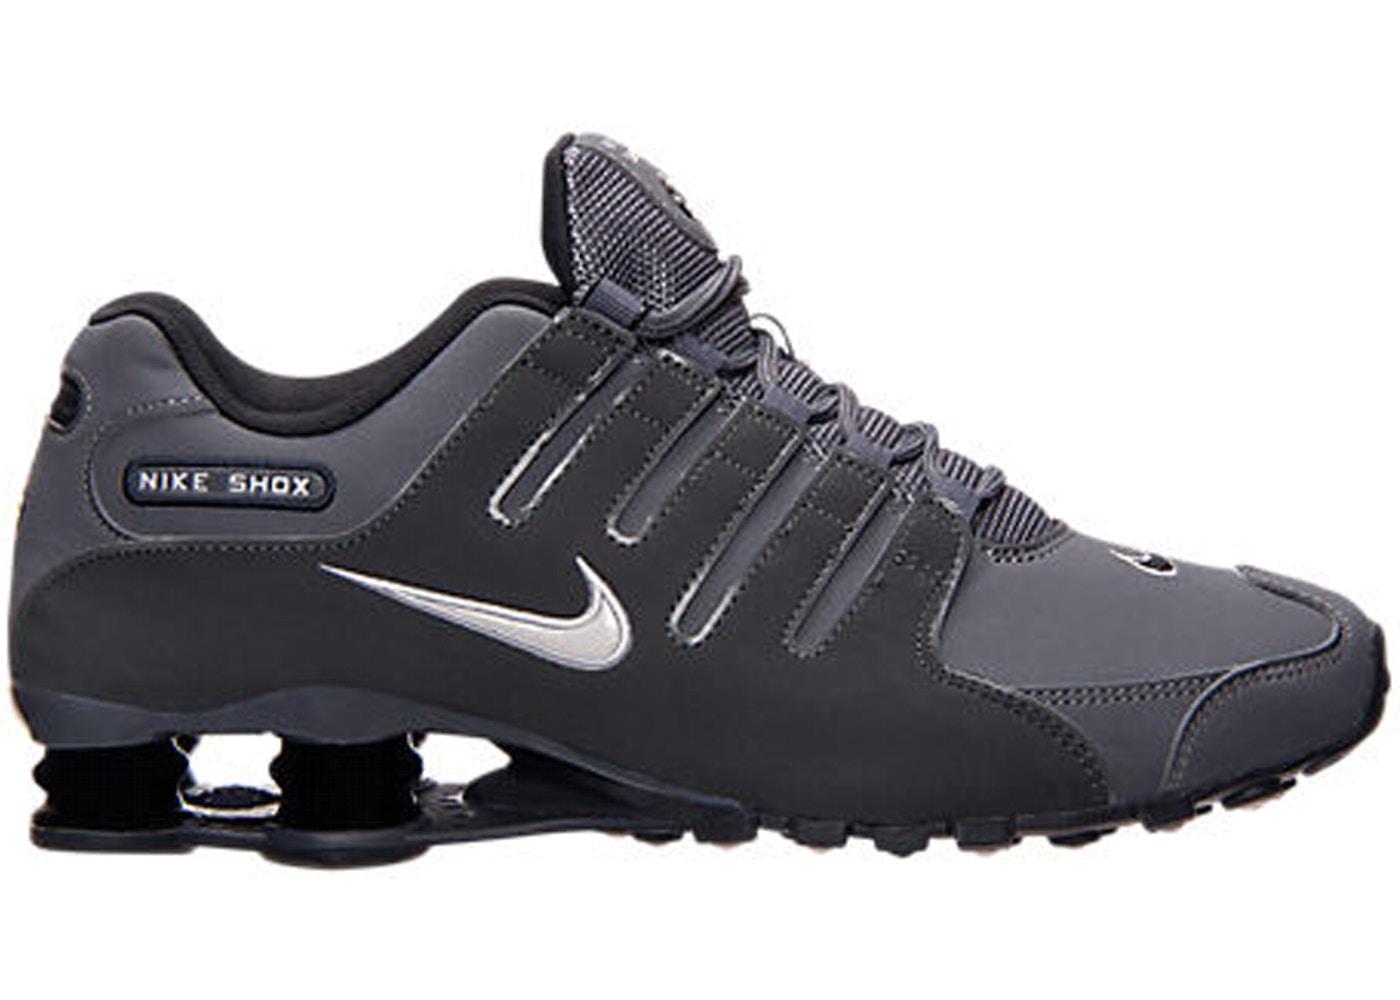 half off 3e188 190ce Nike Shox NZ Dark Grey - 378341-059